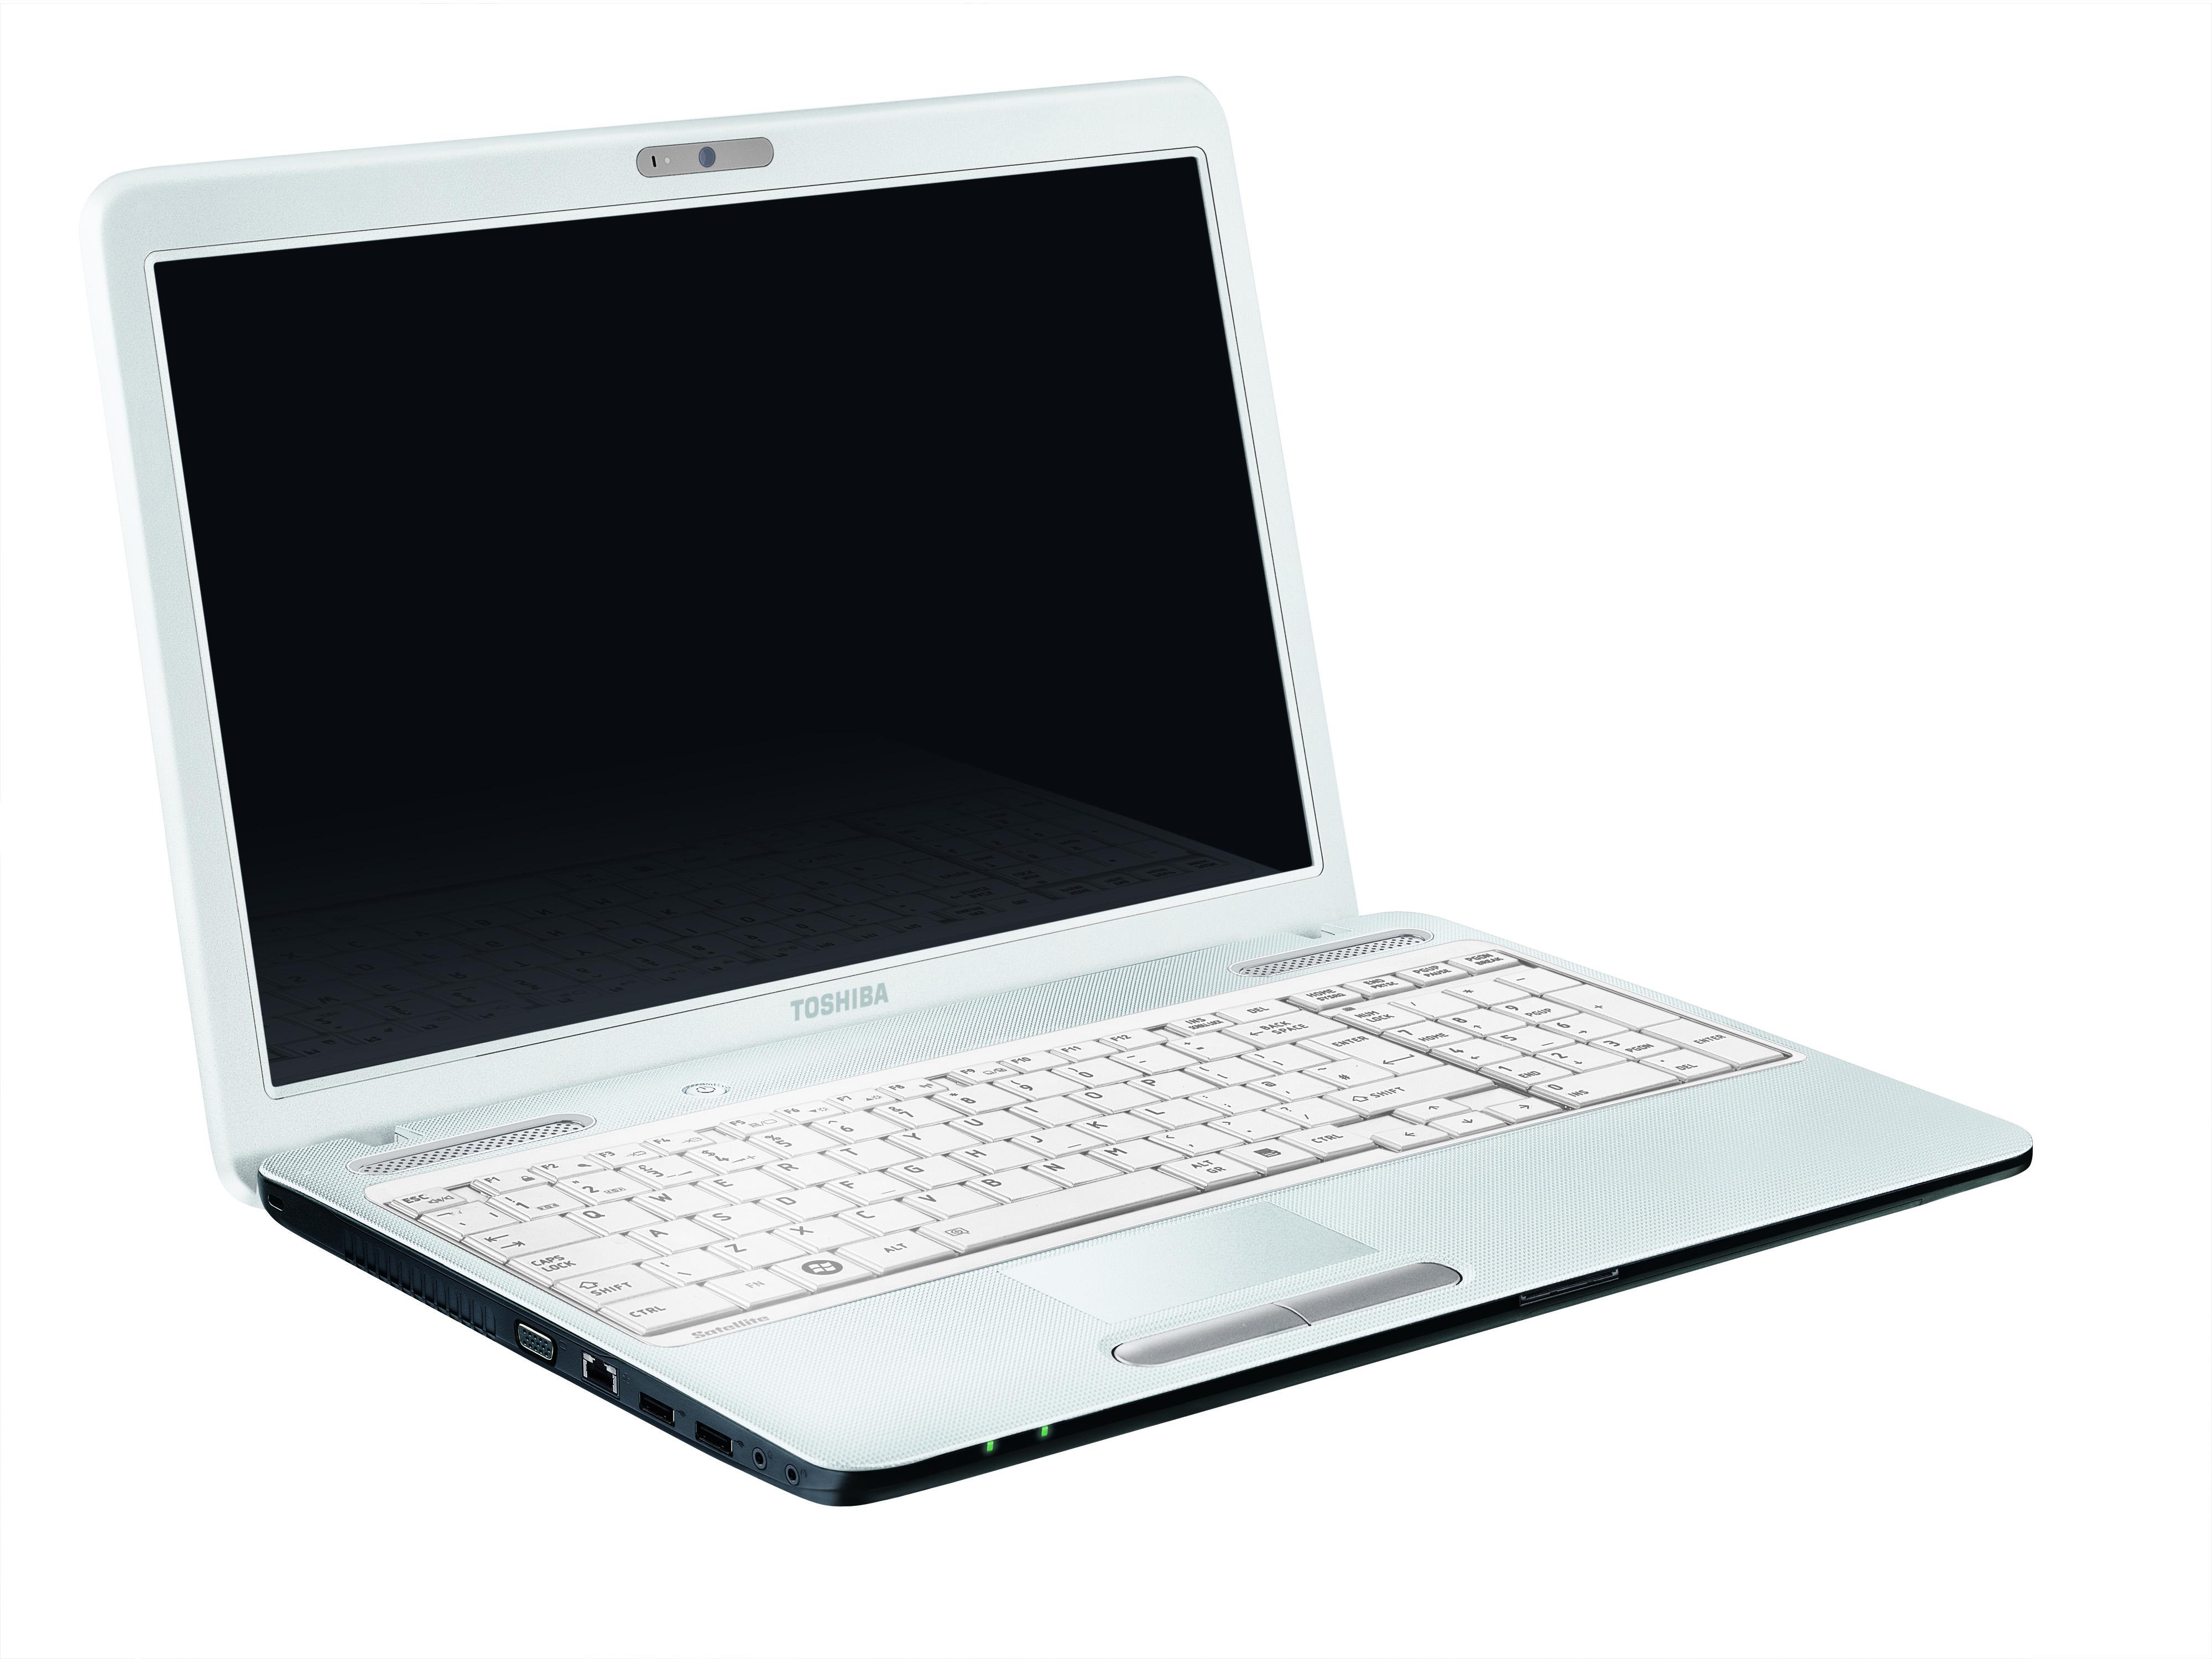 Toshiba Satellite C660D | Laptop Station